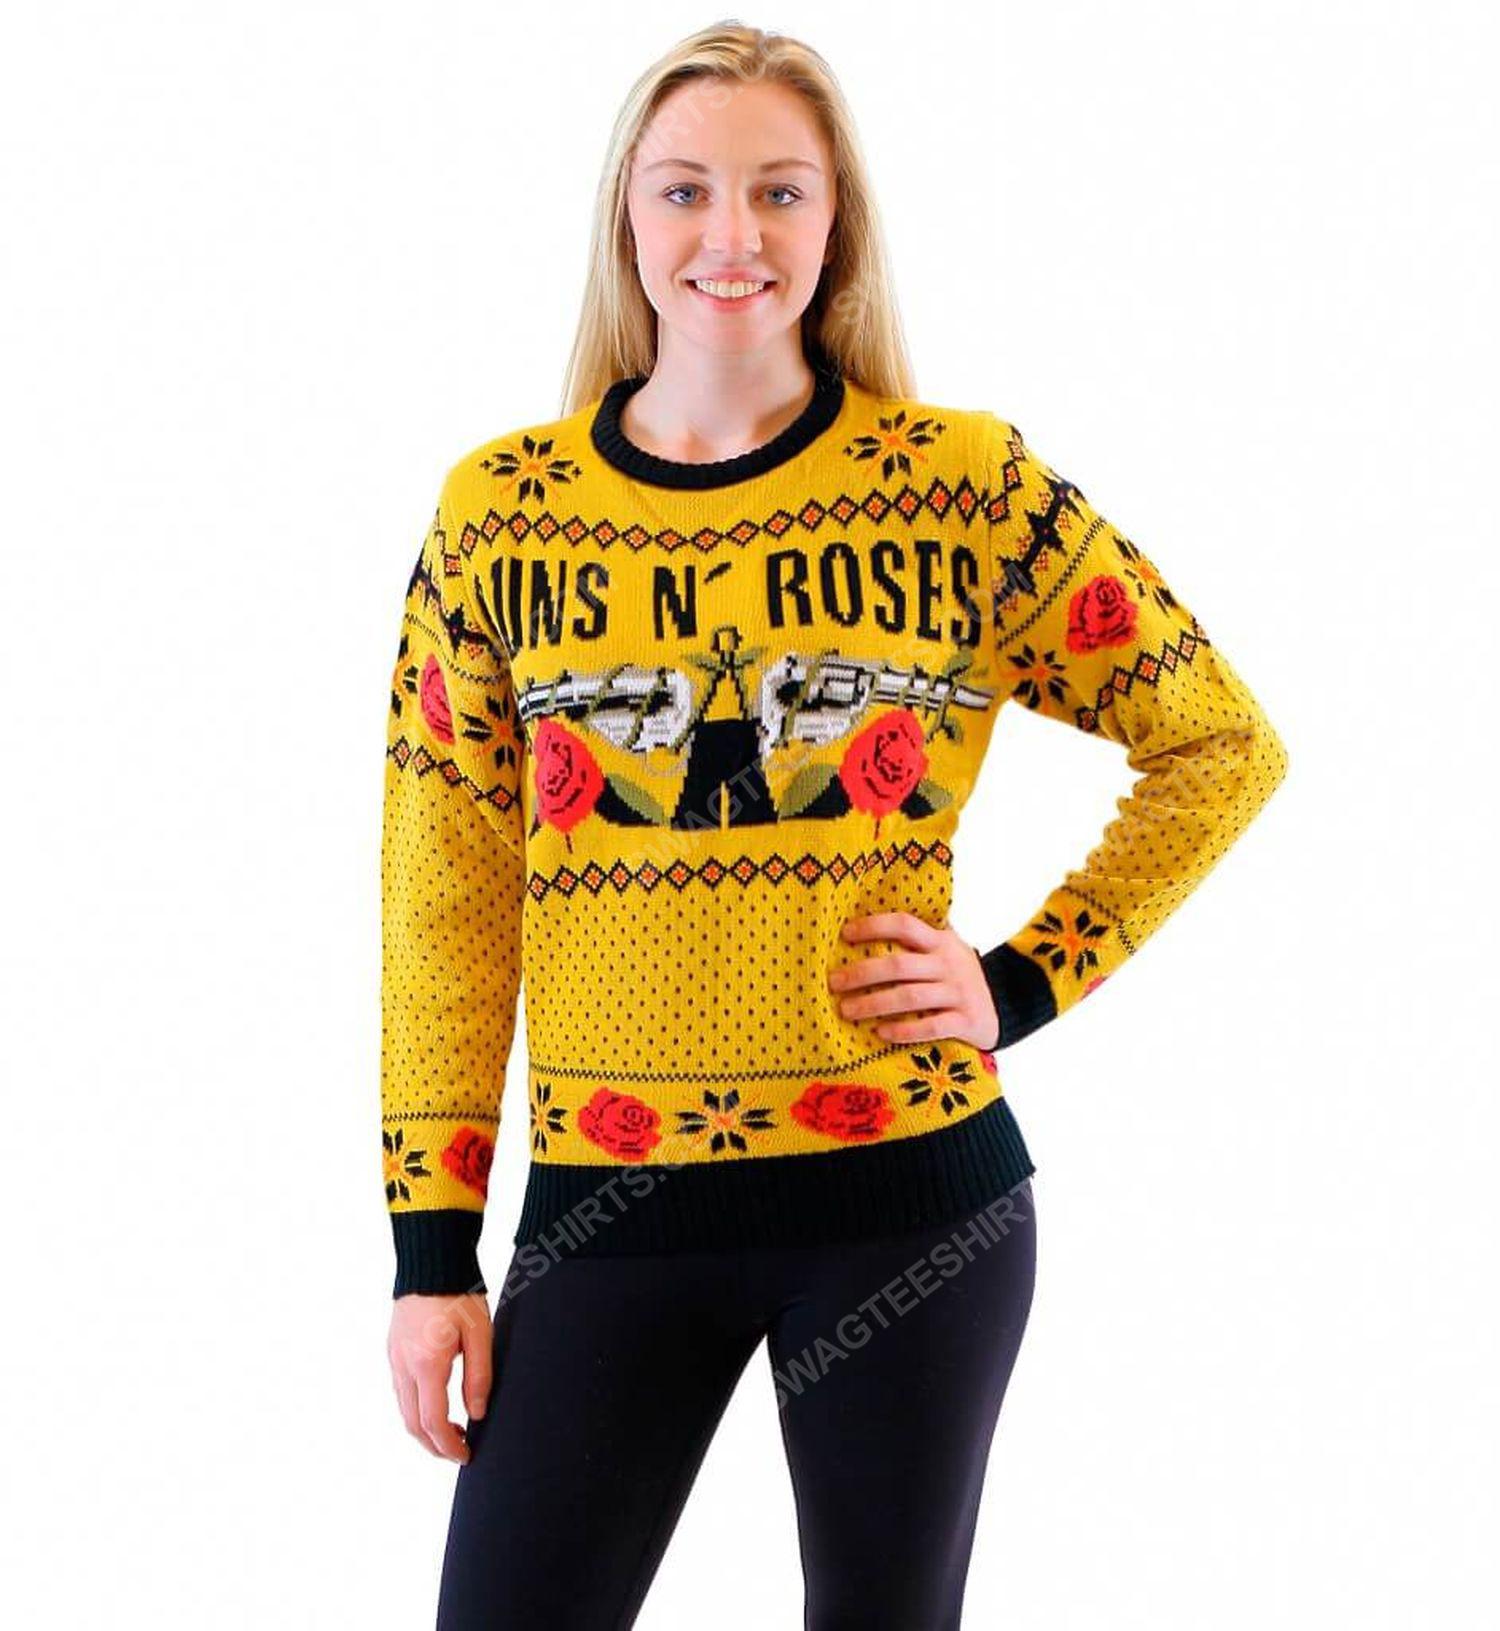 Guns n' roses rock band full print ugly christmas sweater 2